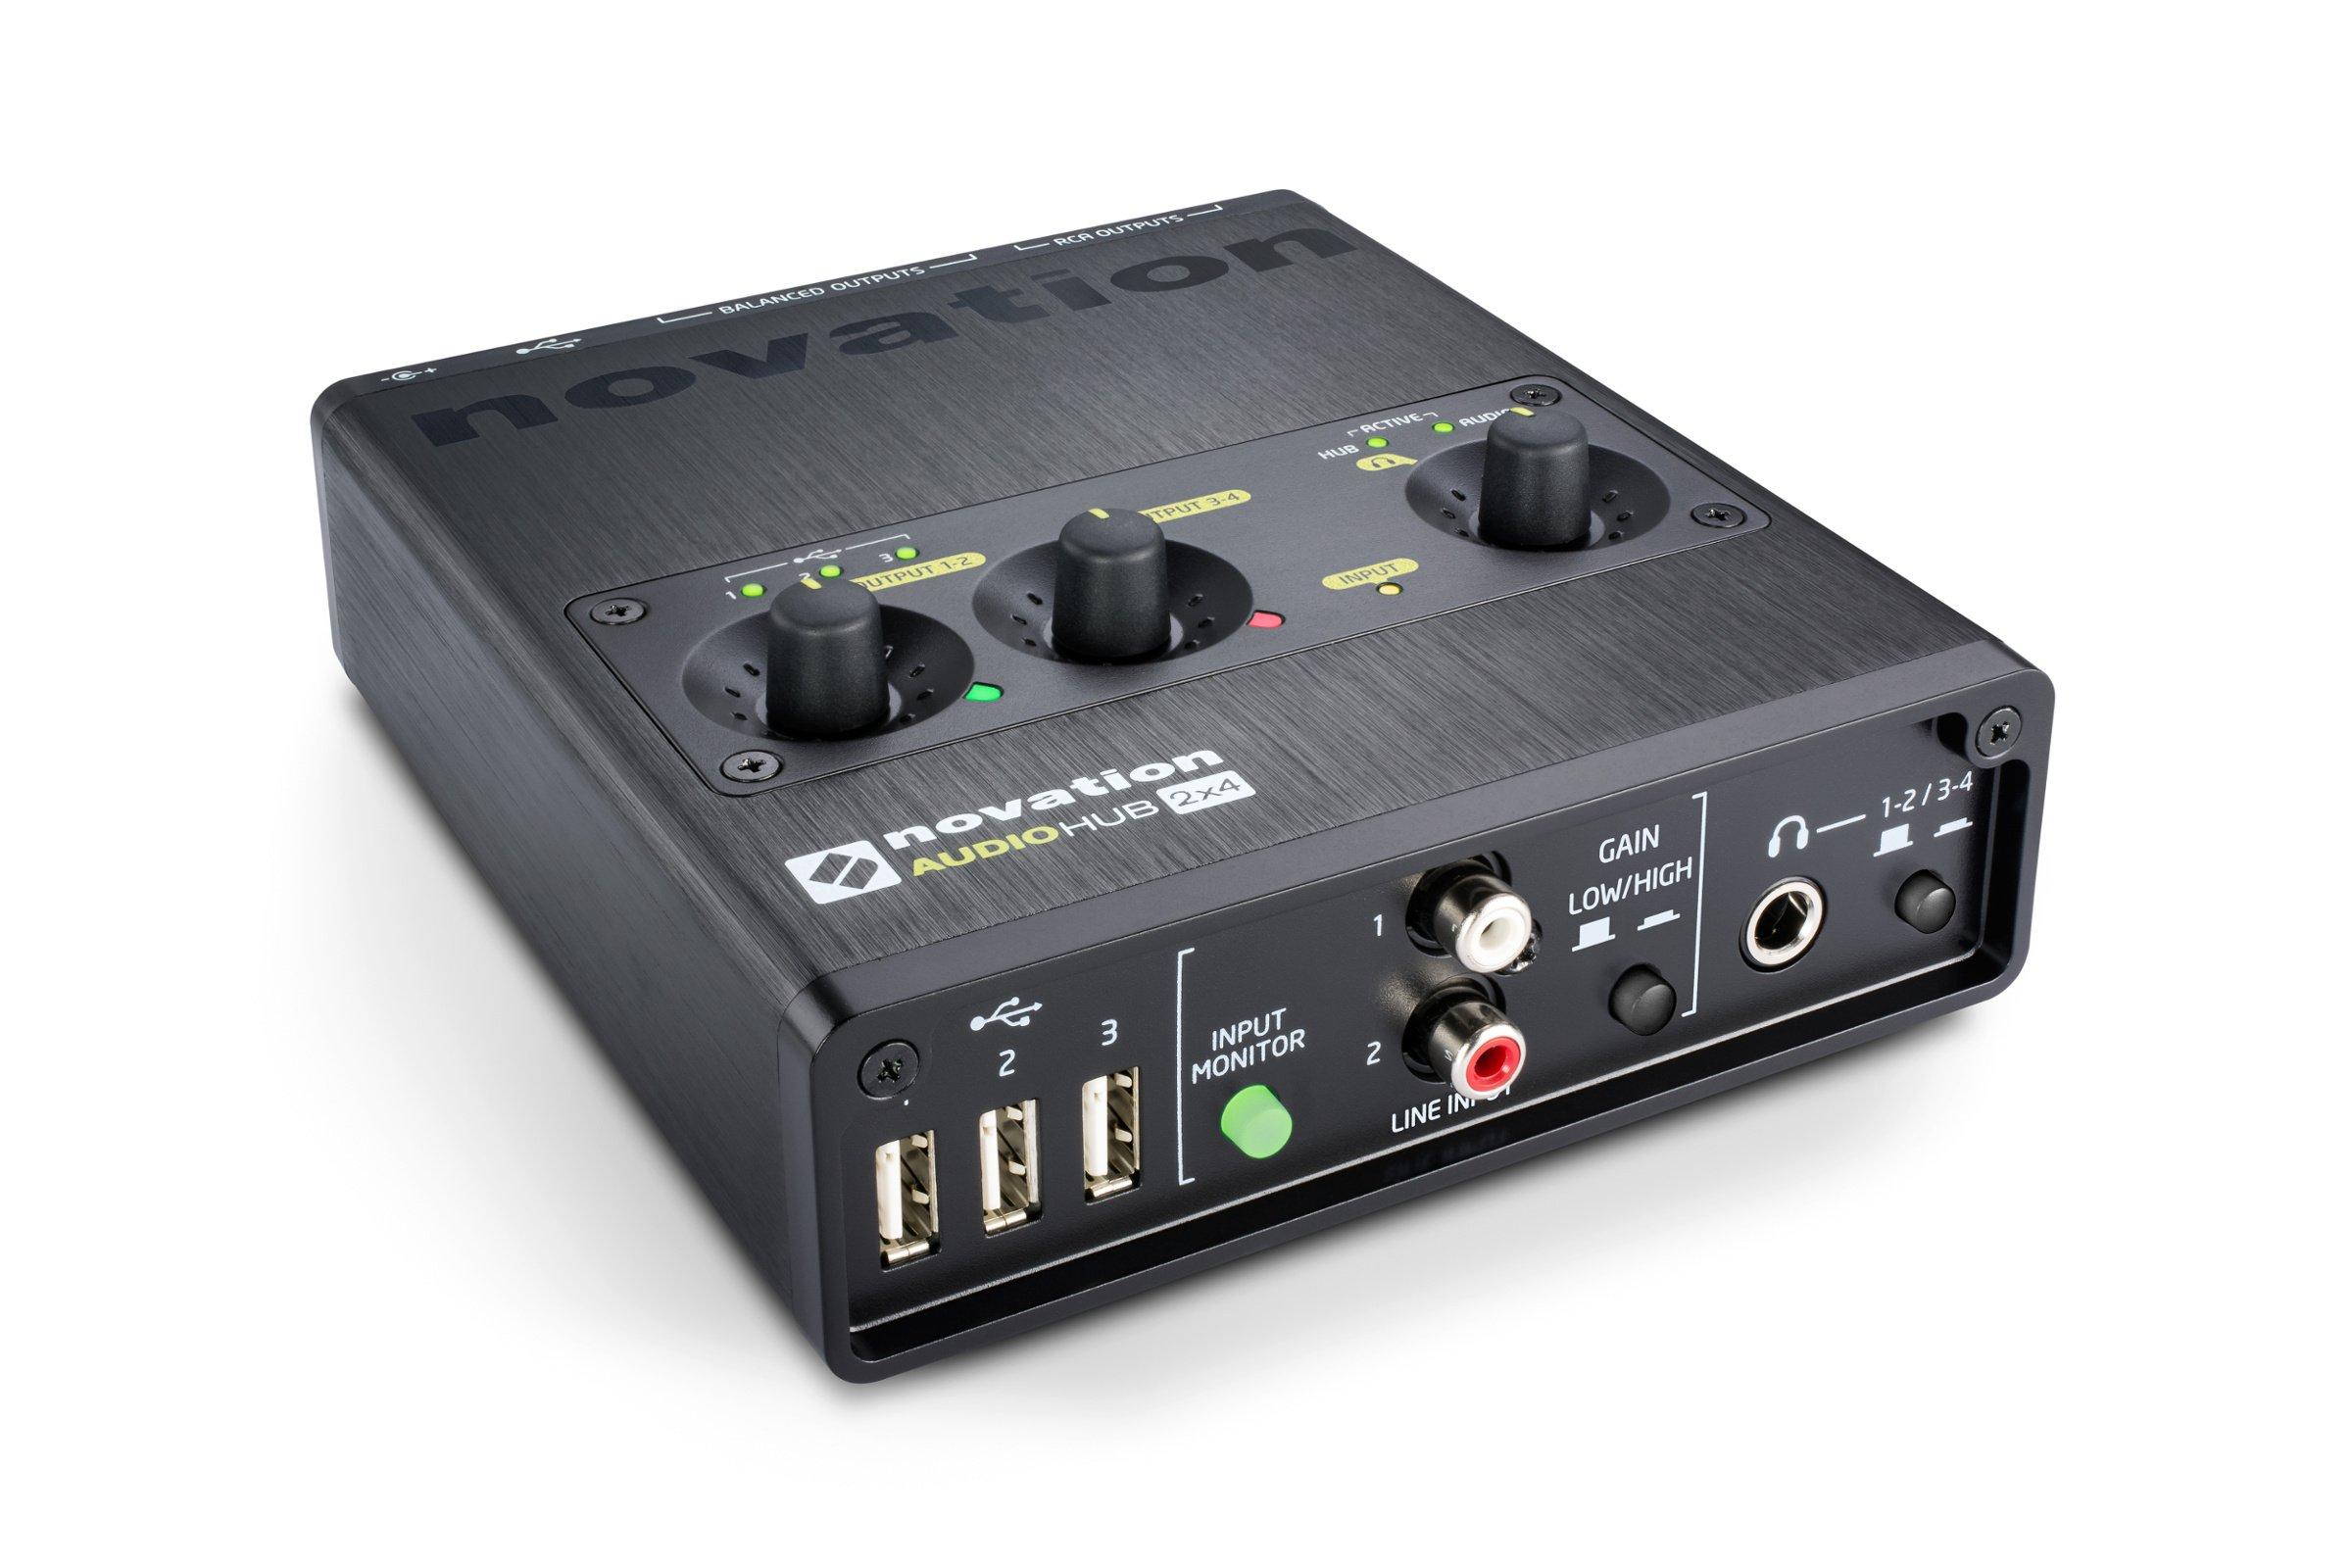 Compact Audio Interface & USB Hub